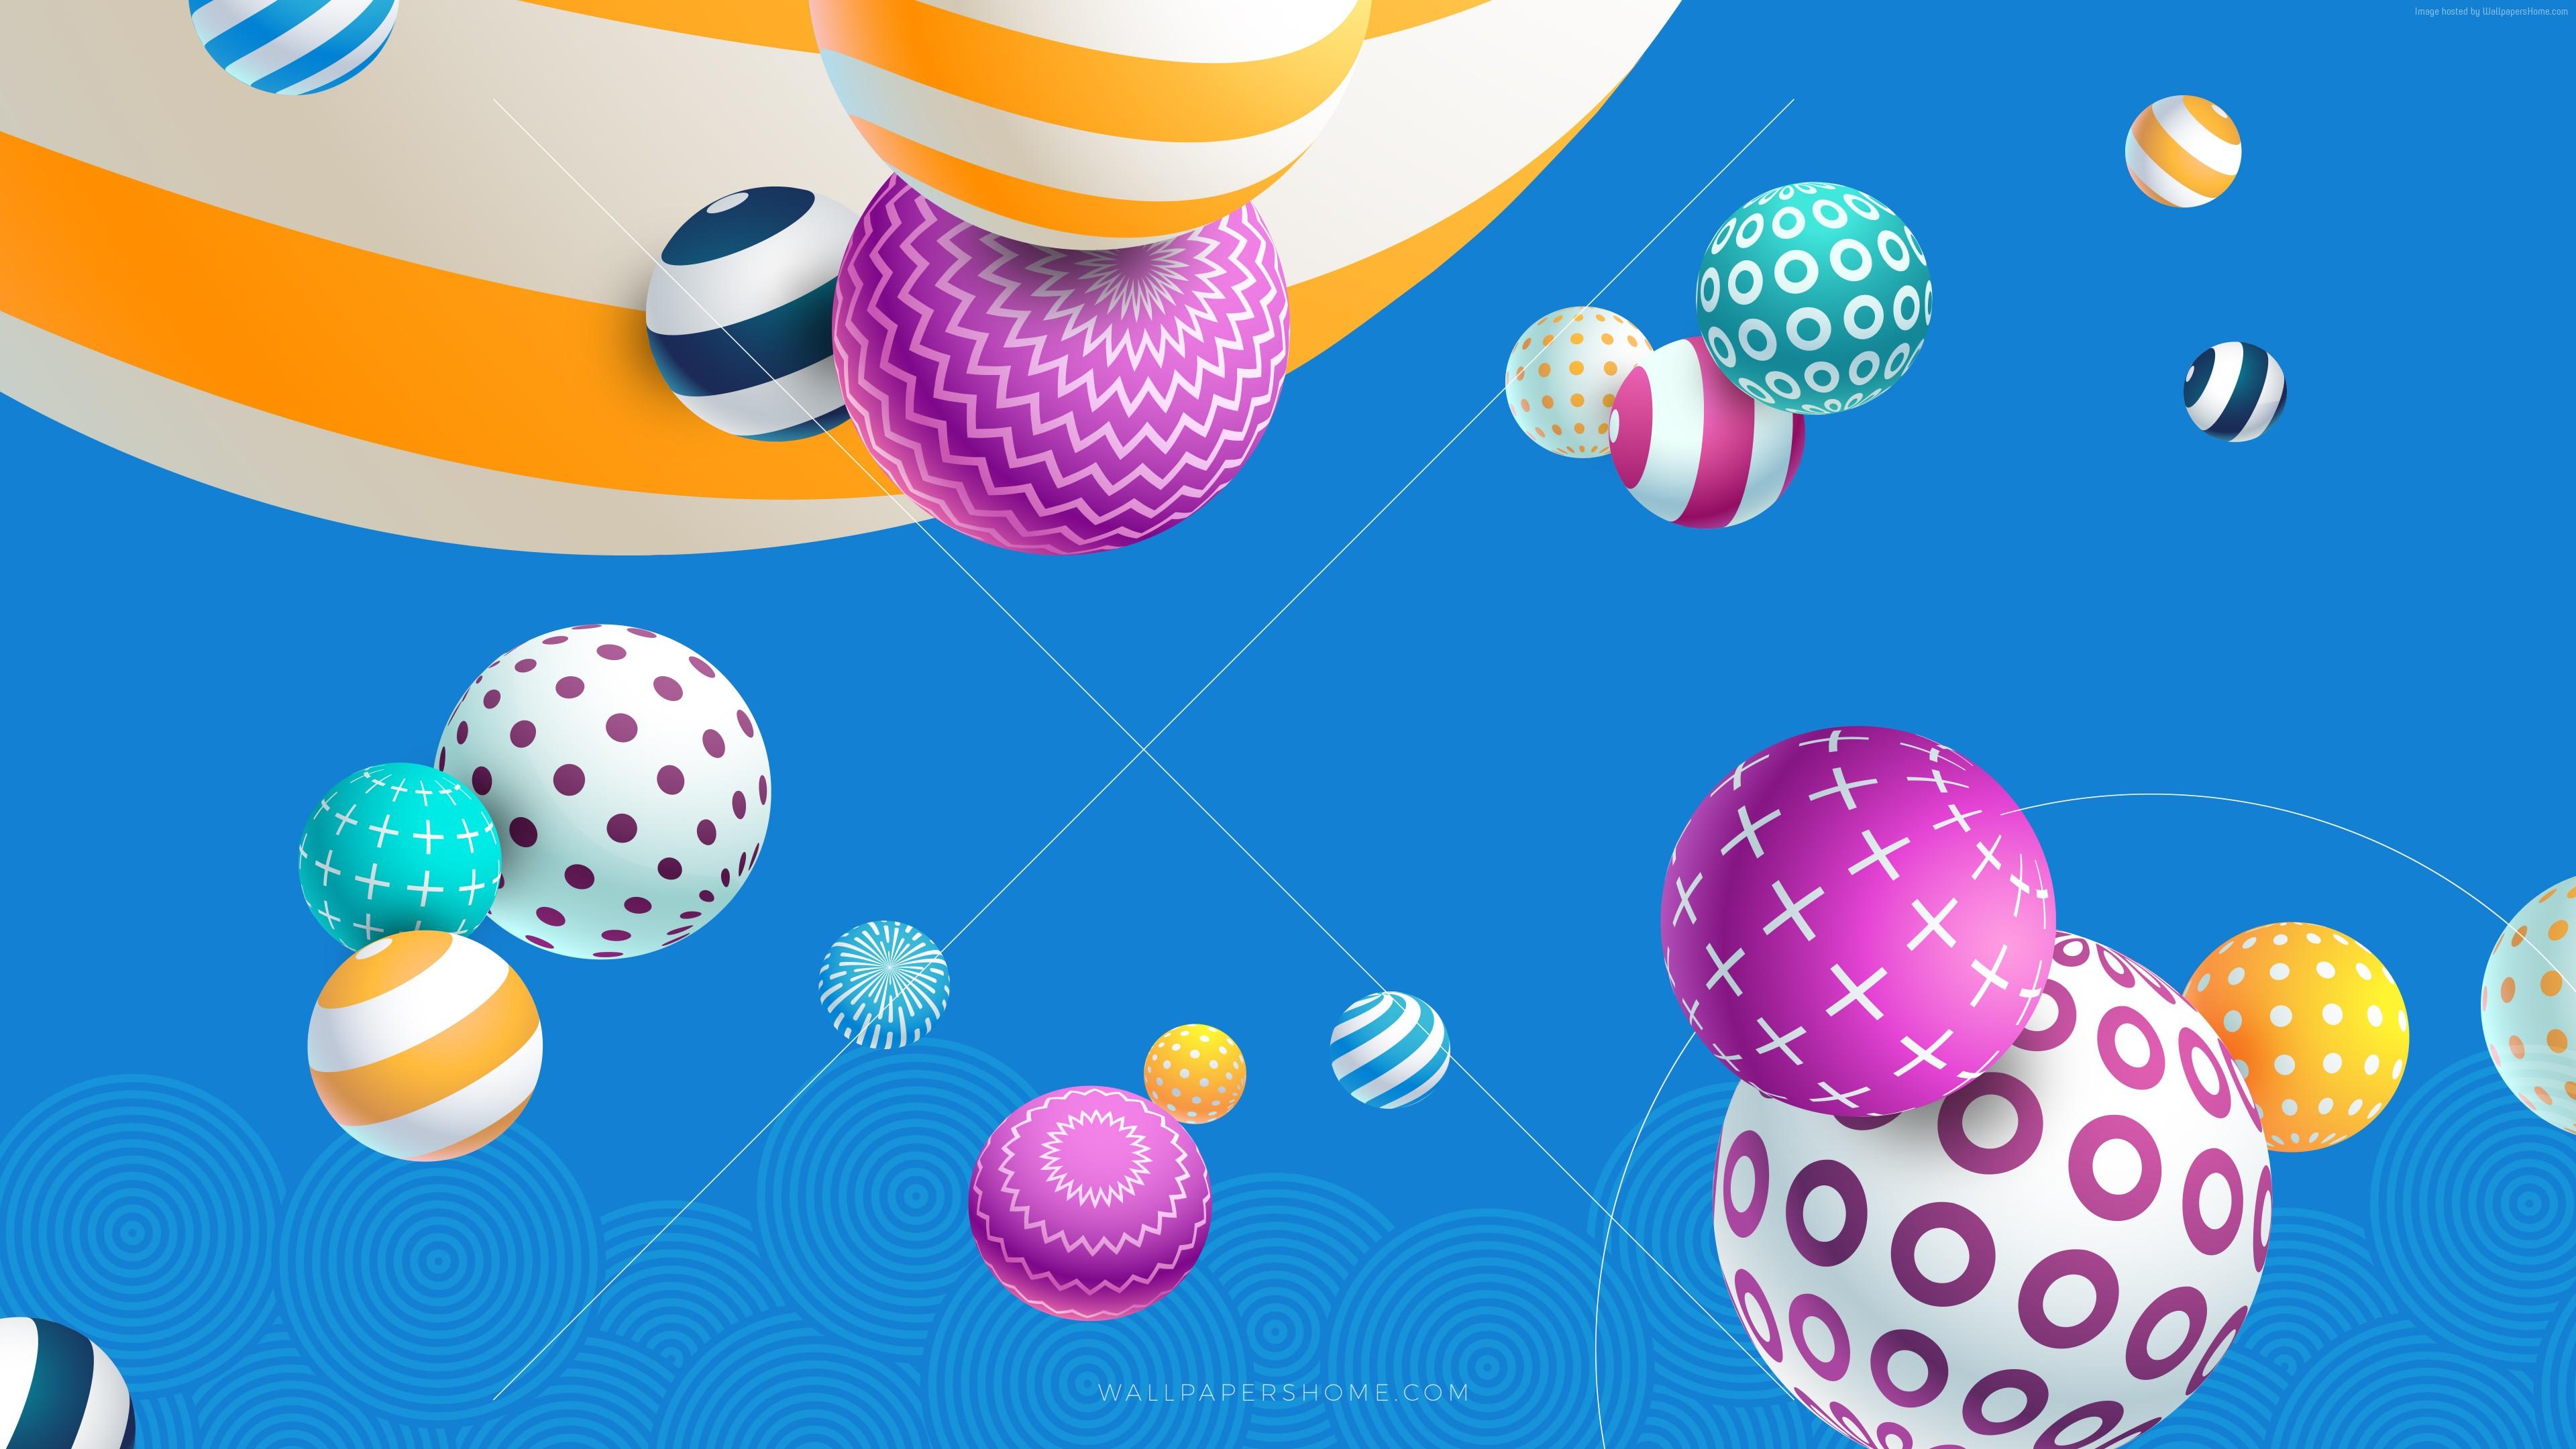 Wallpaper Abstract Balls Colorful Modern 4k 5k 8k